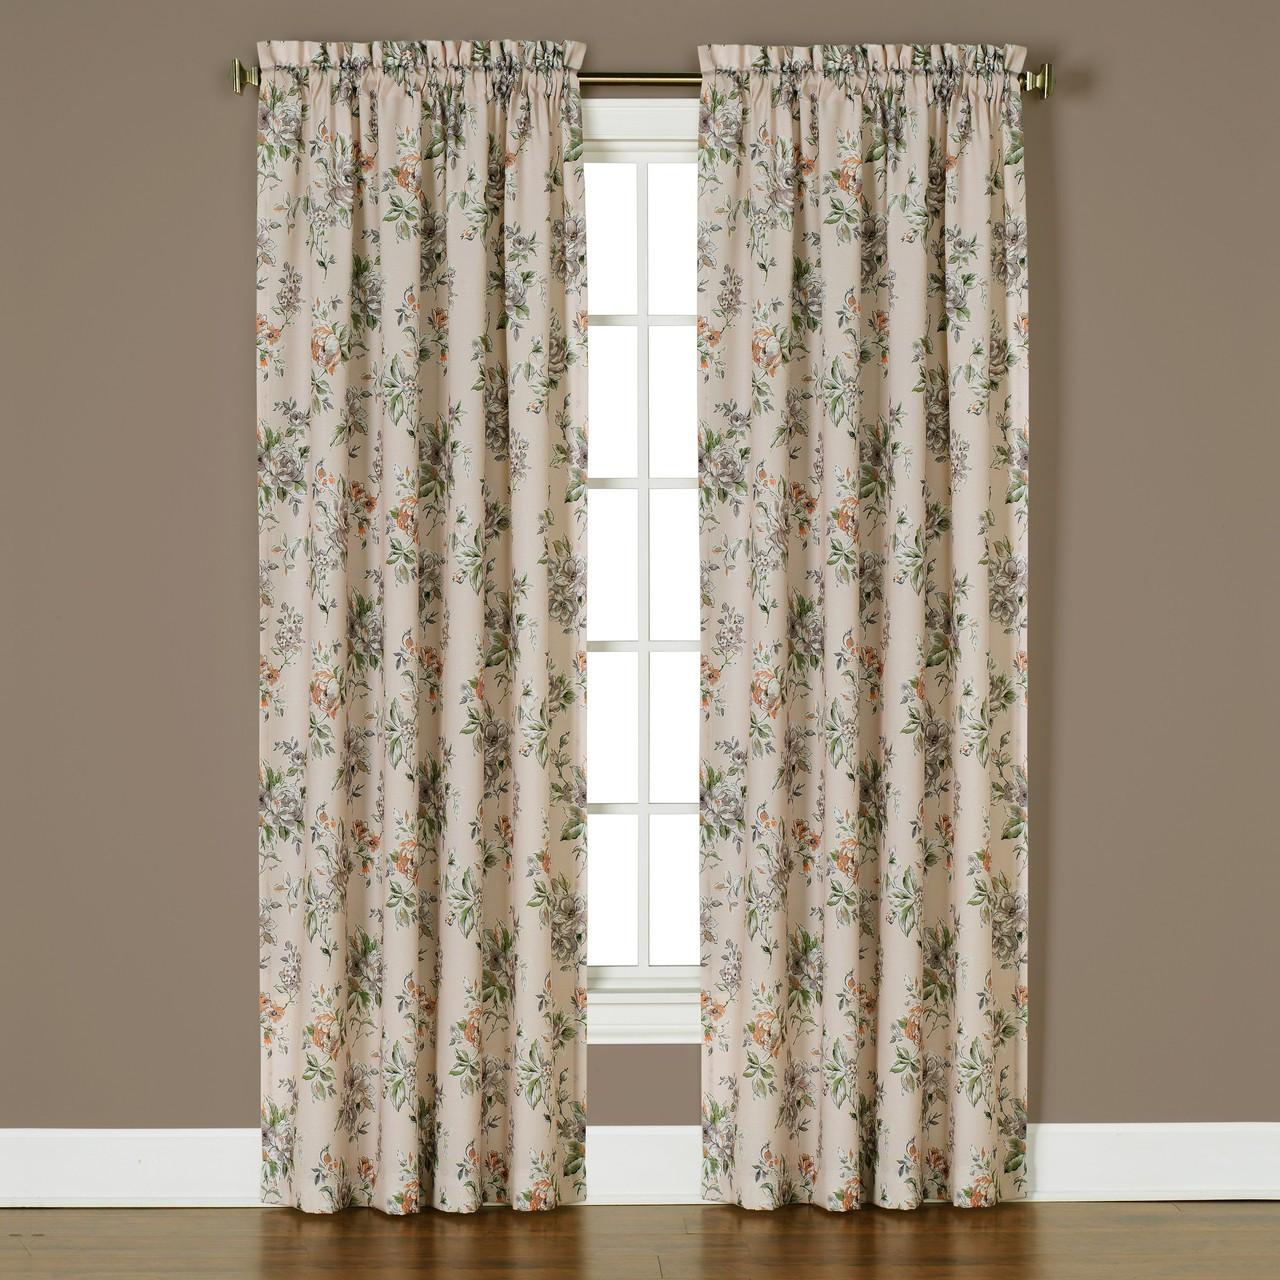 Nellie rose rod pocket curtains 2 panels shown